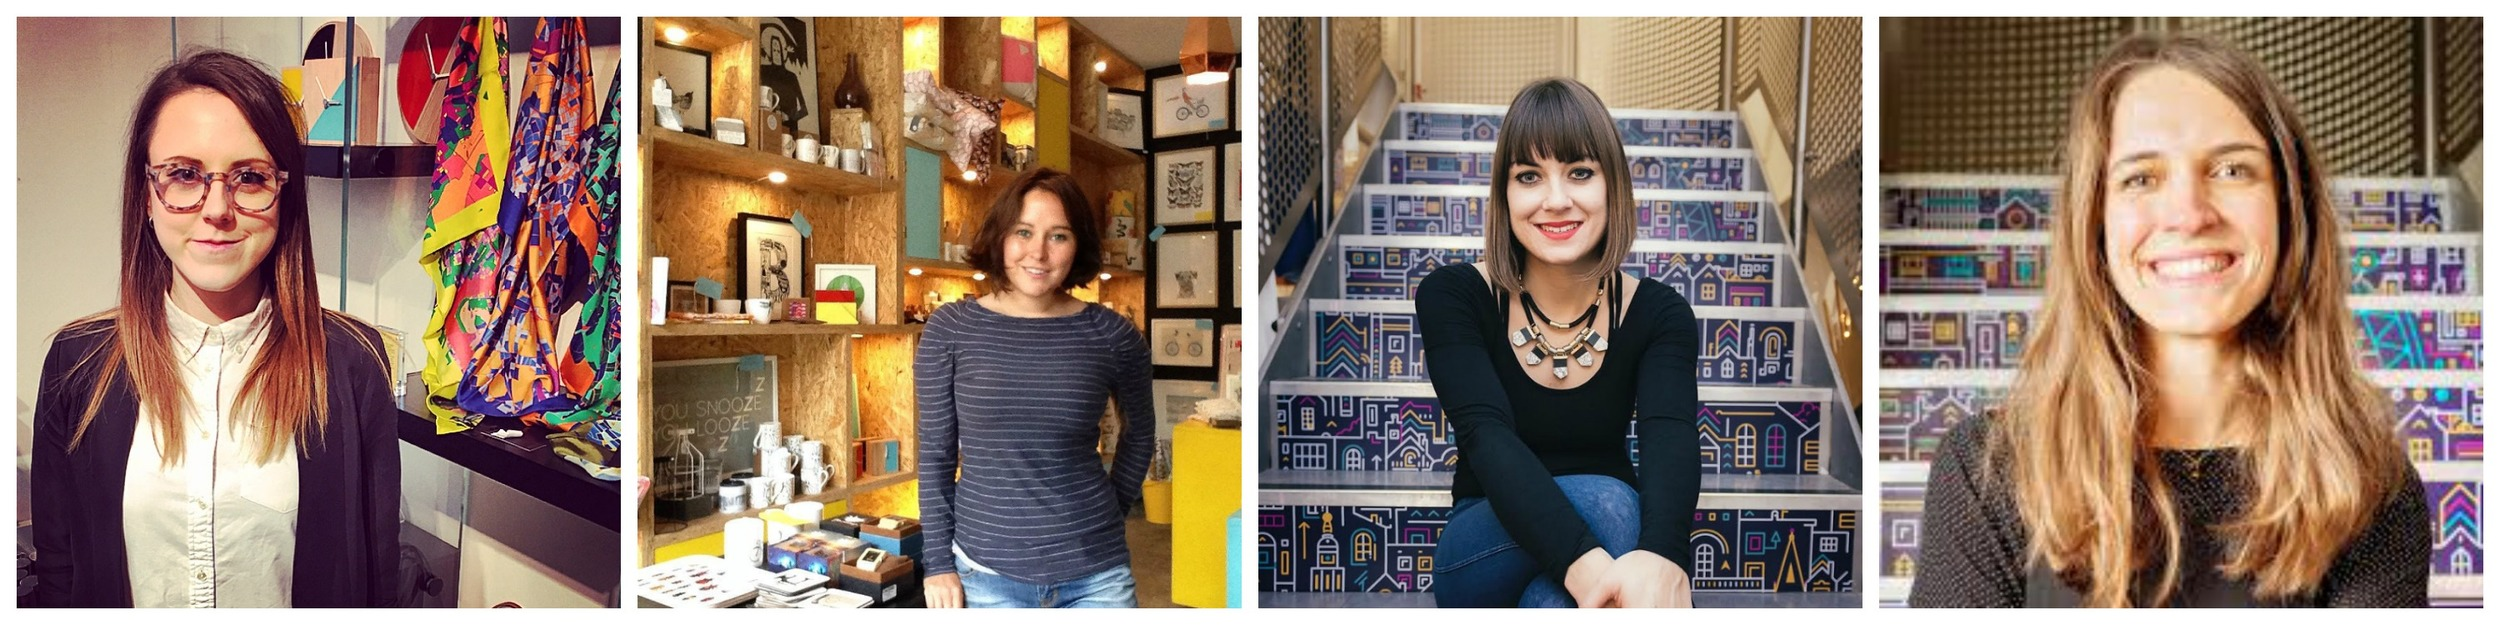 L-R: Emily Rubner, Alice Waters, Alice Mayor, Olivia Hegarty